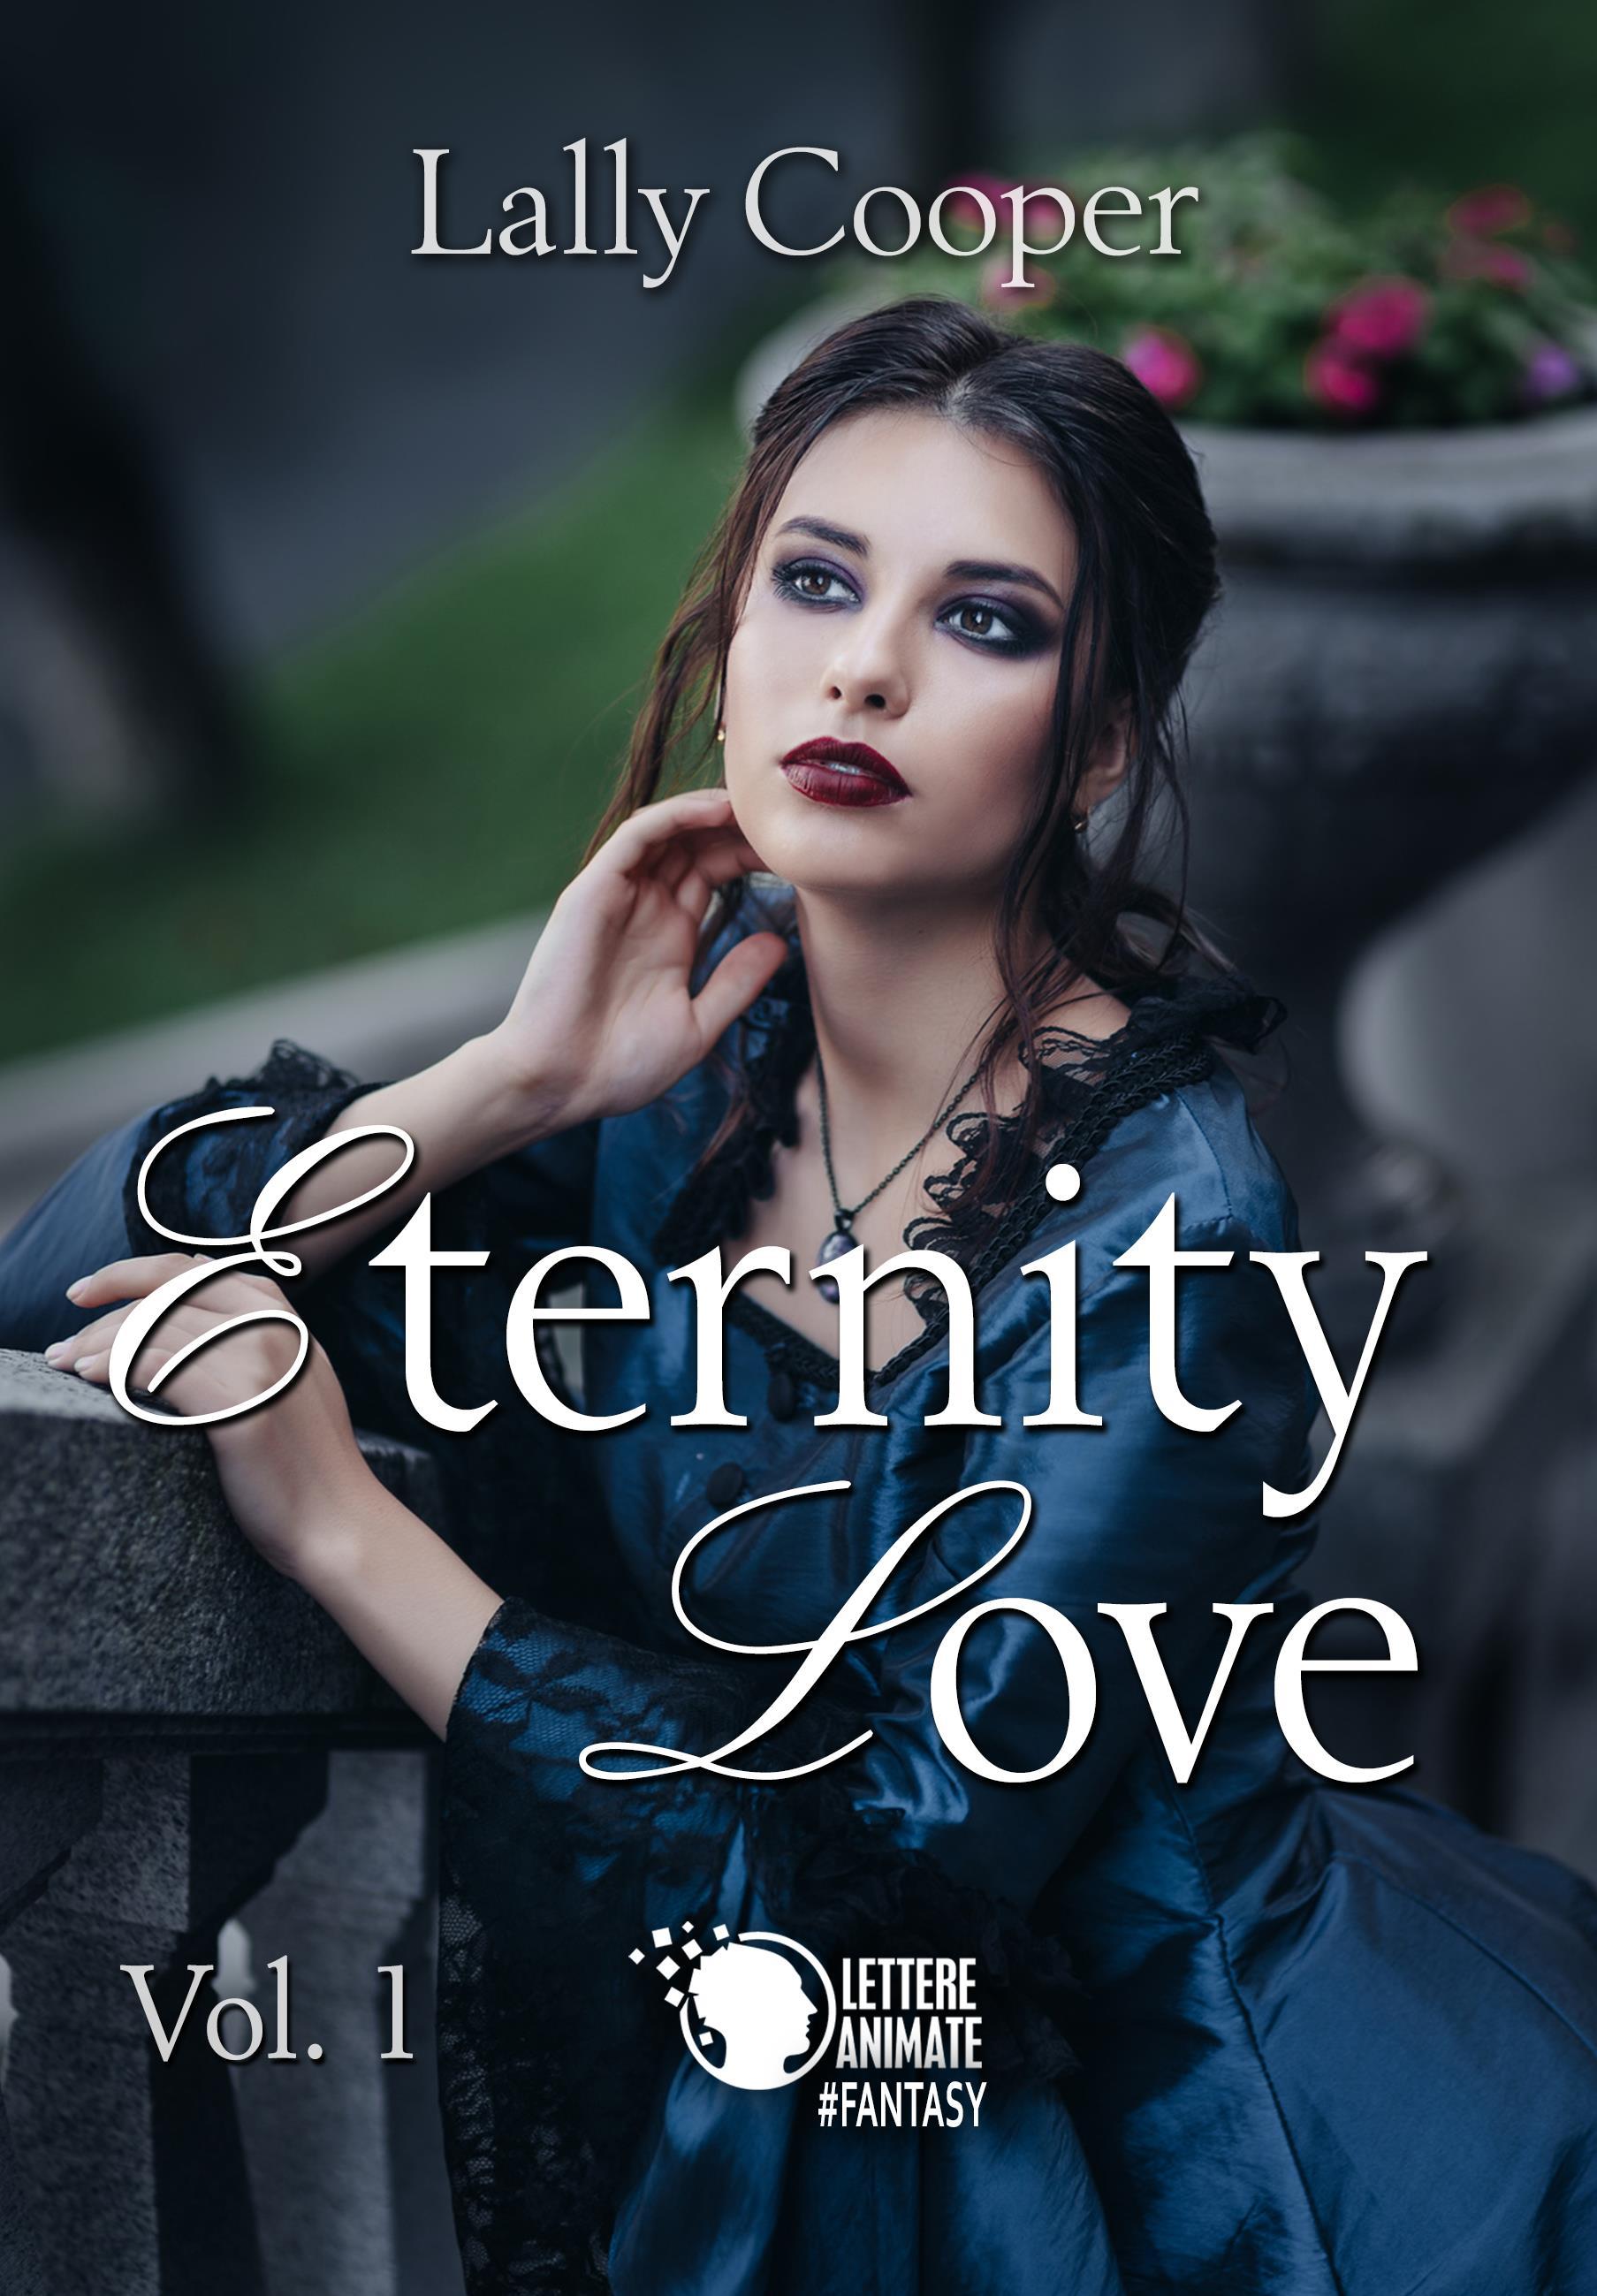 Eternity Love. Vol. 1